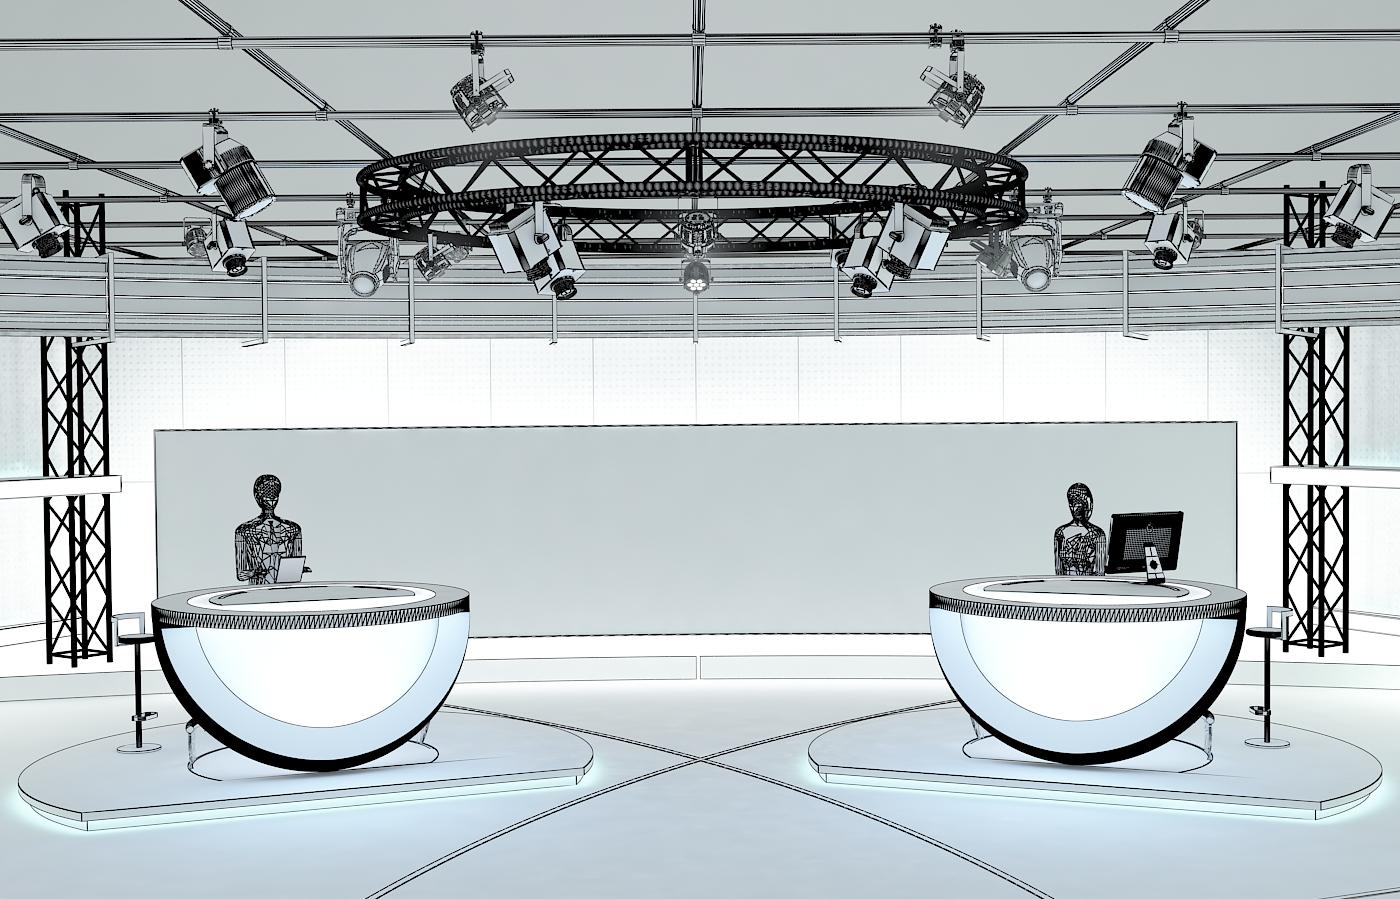 виртуал телевизийн студи цуглуулга vol 6 3d загвар max dxf dwg fbx obj 223404